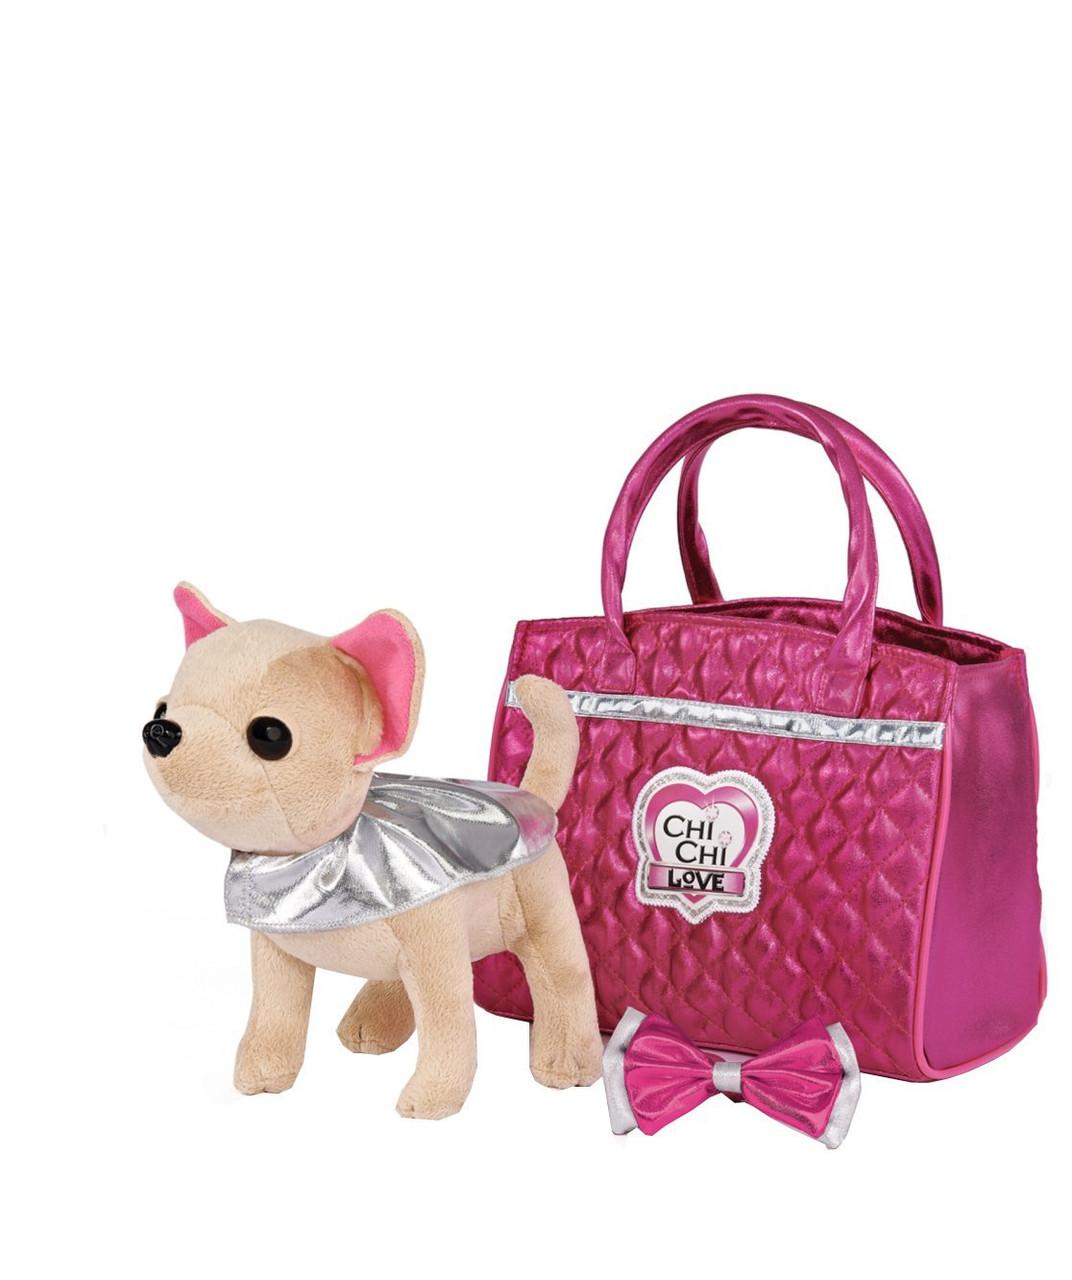 Собачка Чи Чи Лав чихуахуа Модный гламур Chi Chi Love оригинальная Simba 5892280